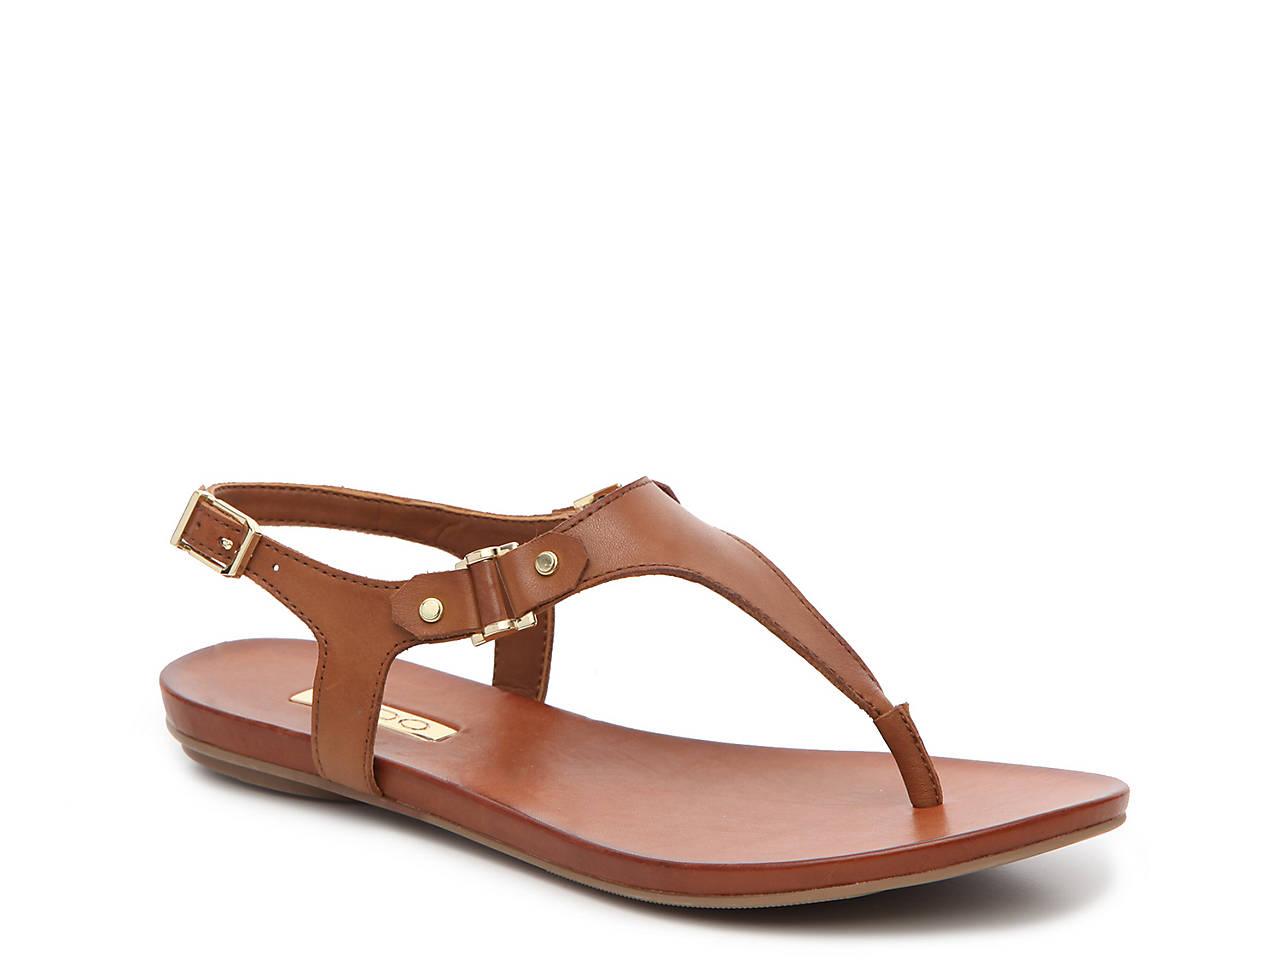 df029616f57c Aldo Qoima Flat Sandal Women s Shoes